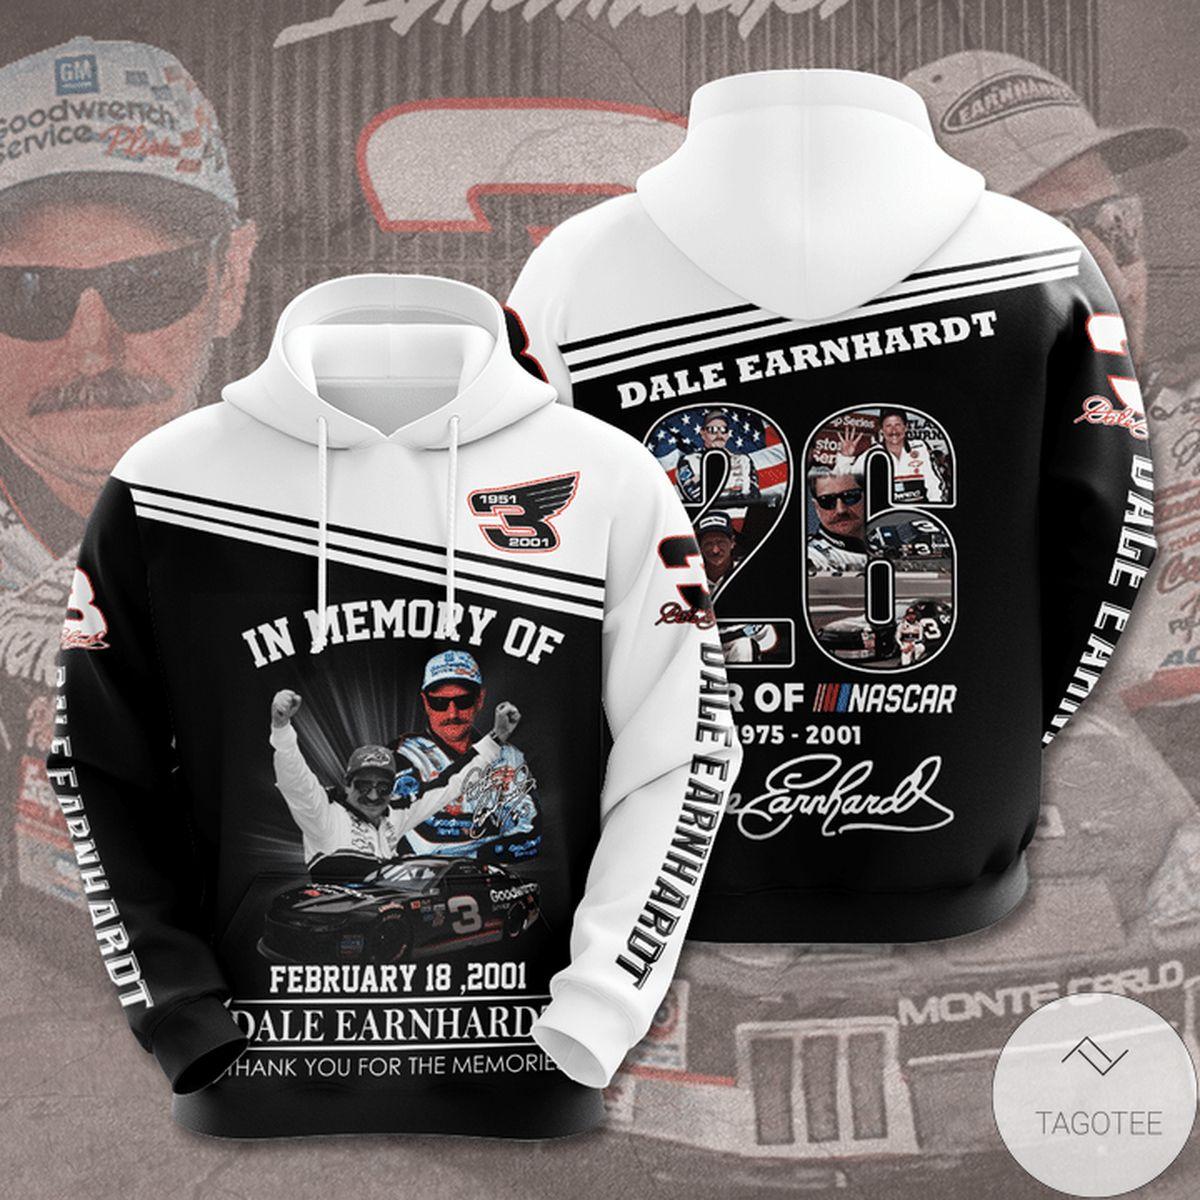 Best Shop In Memory Of February 18 2021 Dale Earnhardt Hoodie